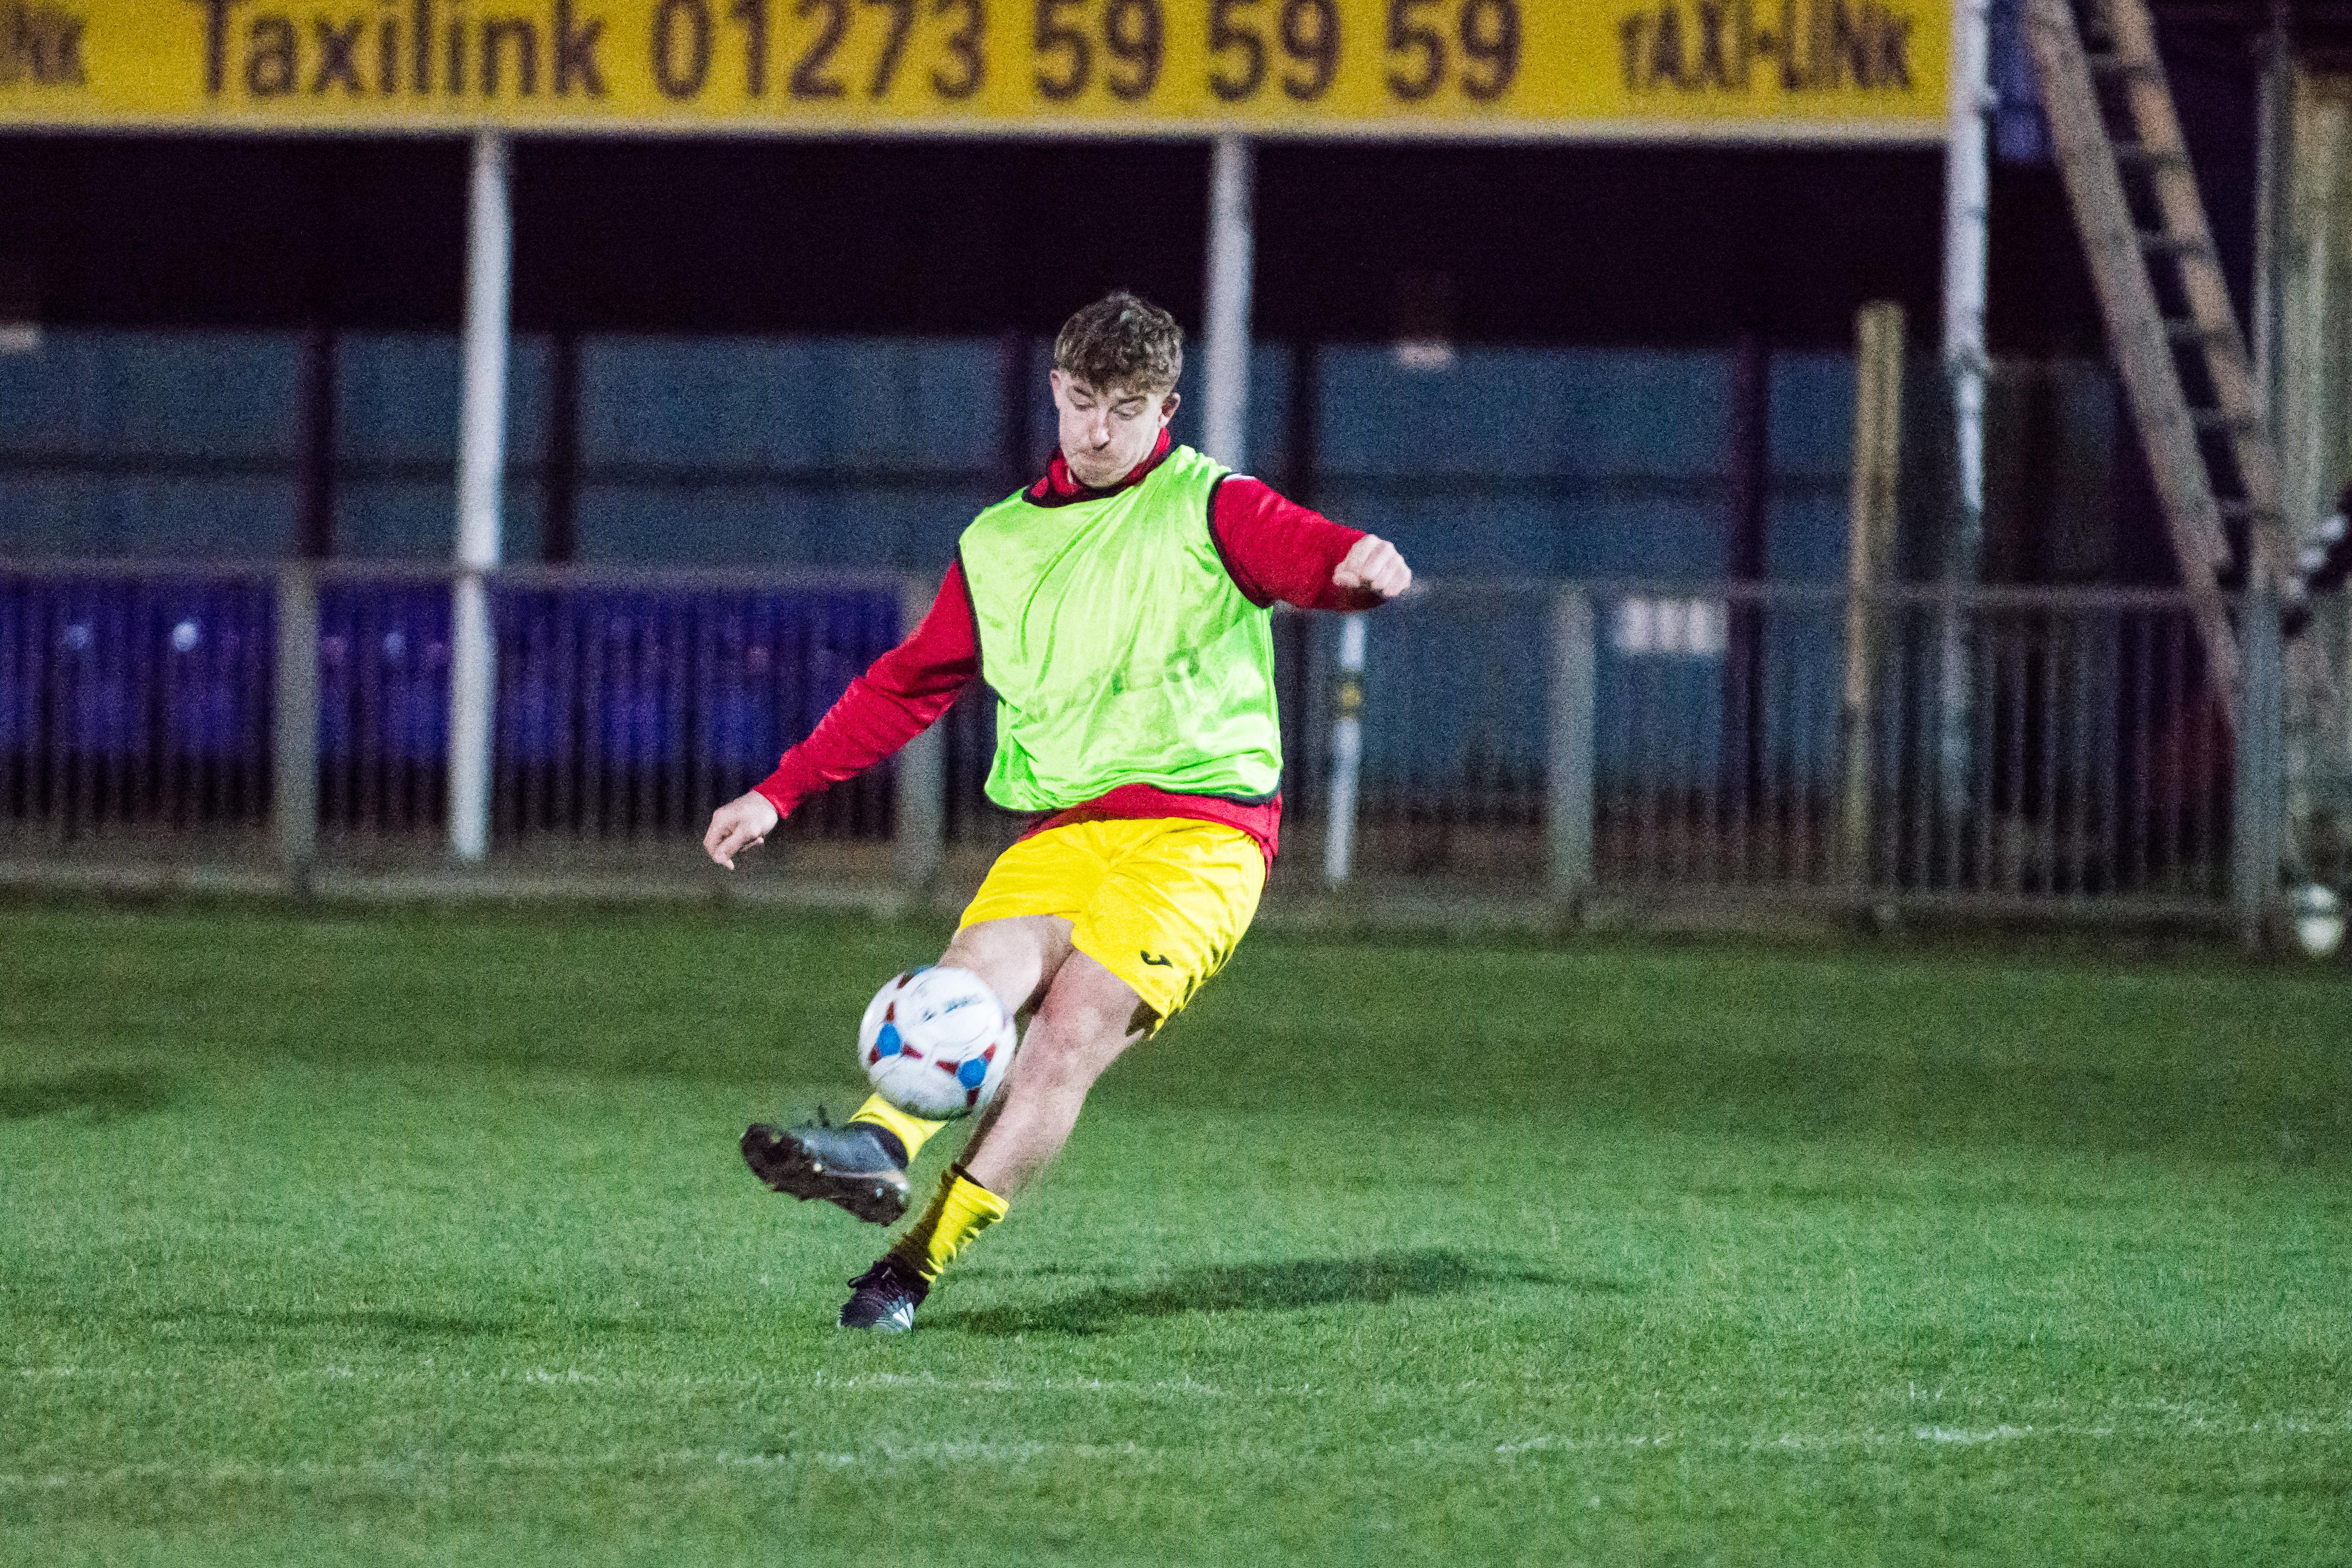 DAVID_JEFFERY Shoreham FC U18s vs Woking FC Academy 22.03.18 06